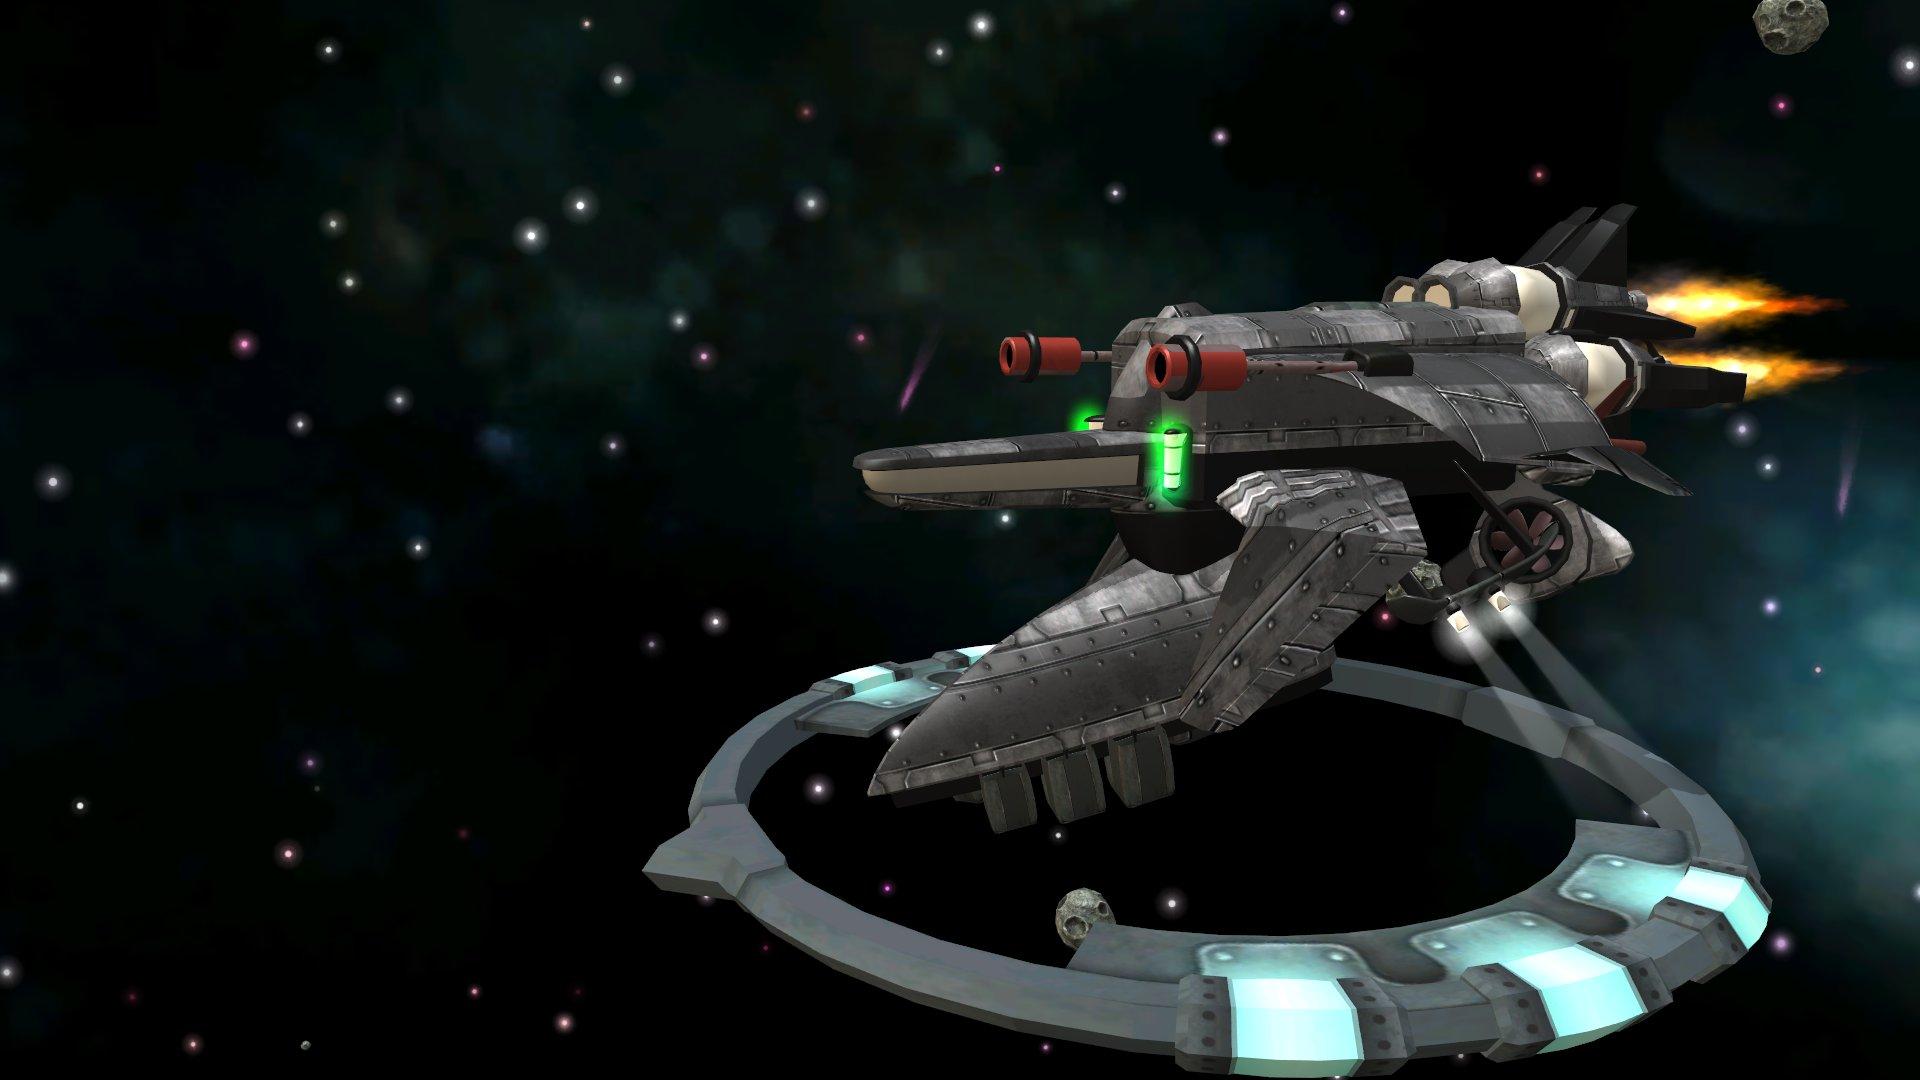 (21) Naves del imperio Neimerer VzV52Zy